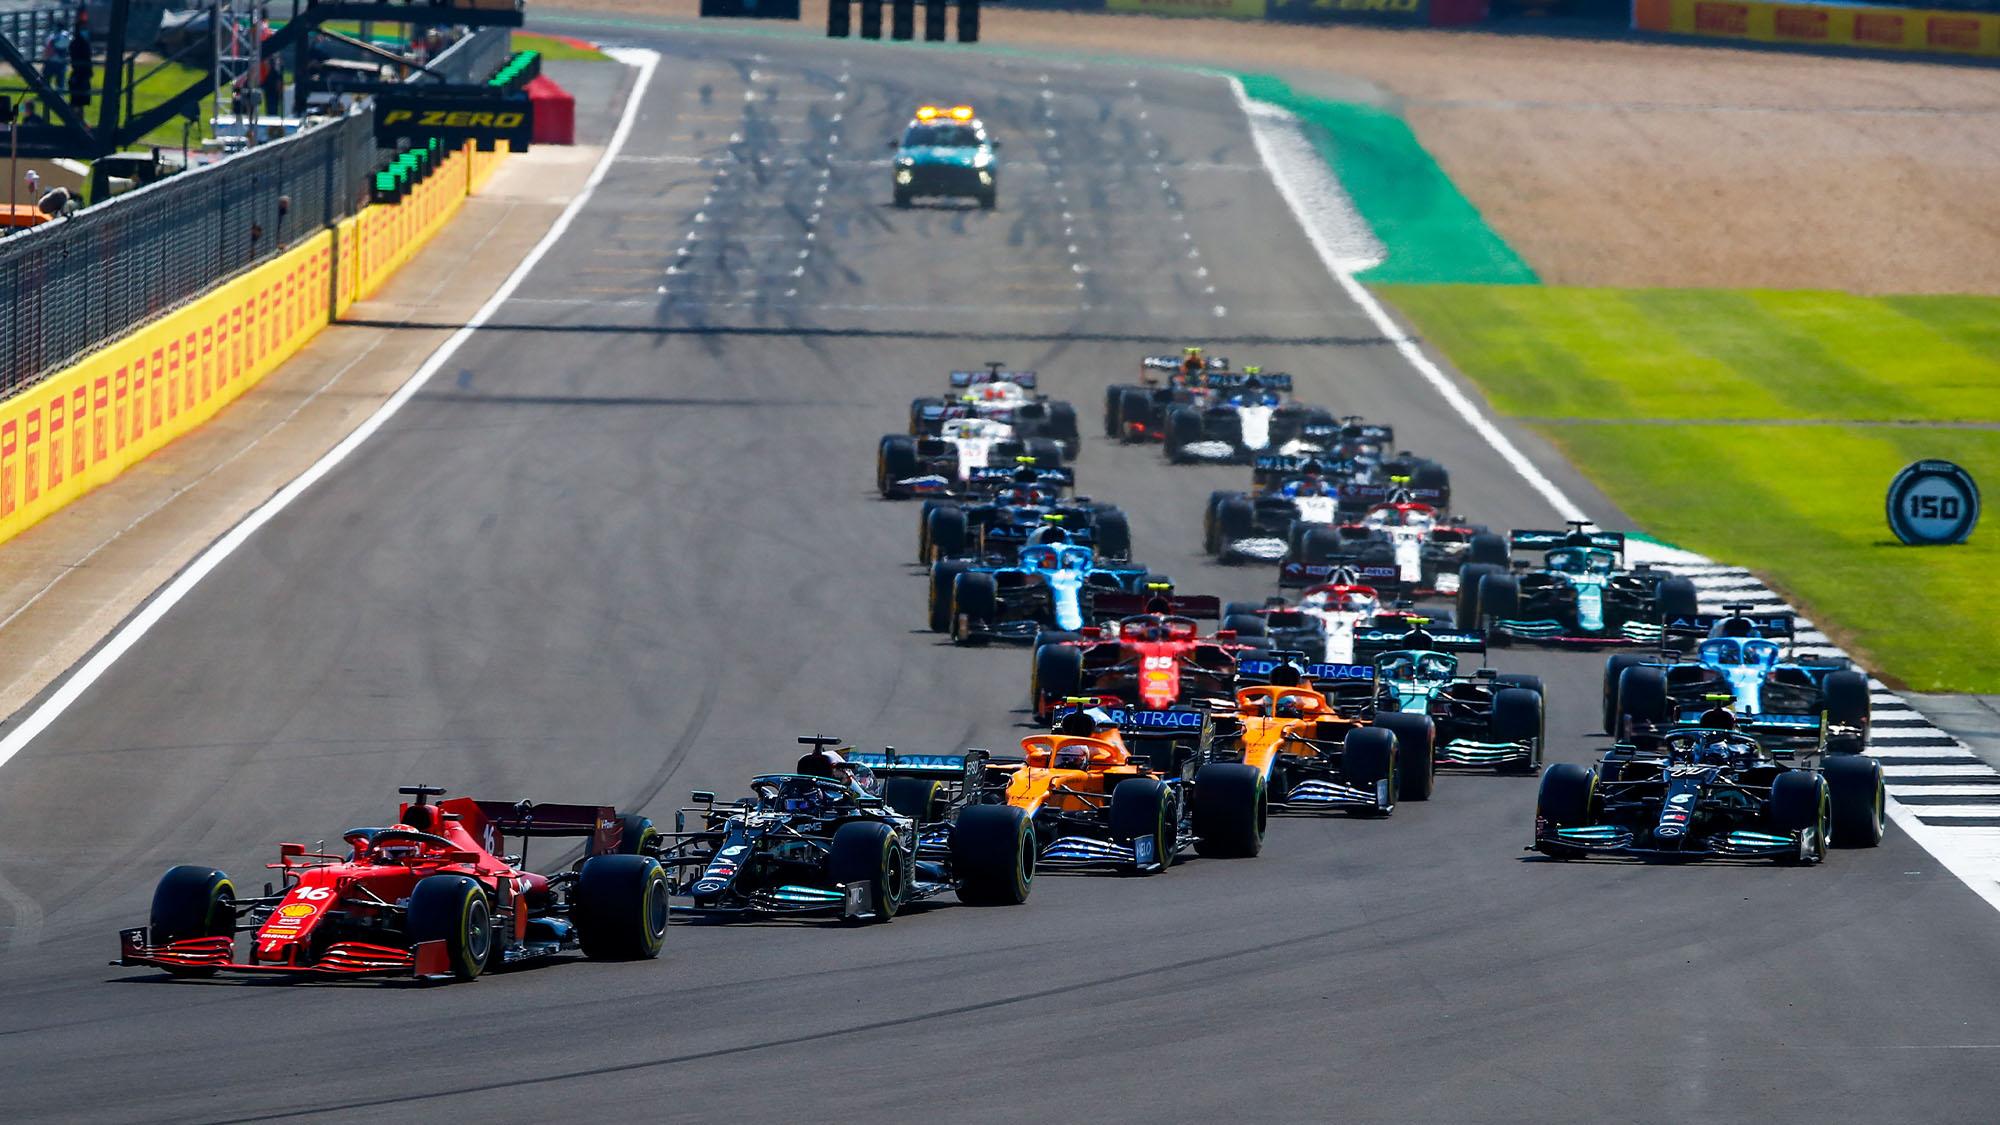 Second start, 16 LECLERC Charles (mco), Scuderia Ferrari SF21, action during the Formula 1 Pirelli British Grand Prix 2021, 10th round of the 2021 FIA Formula One World Championship from July 16 to 18, 2021 on the Silverstone Circuit, in Silverstone, United Kingdom - Photo Xavi Bonilla / DPPI